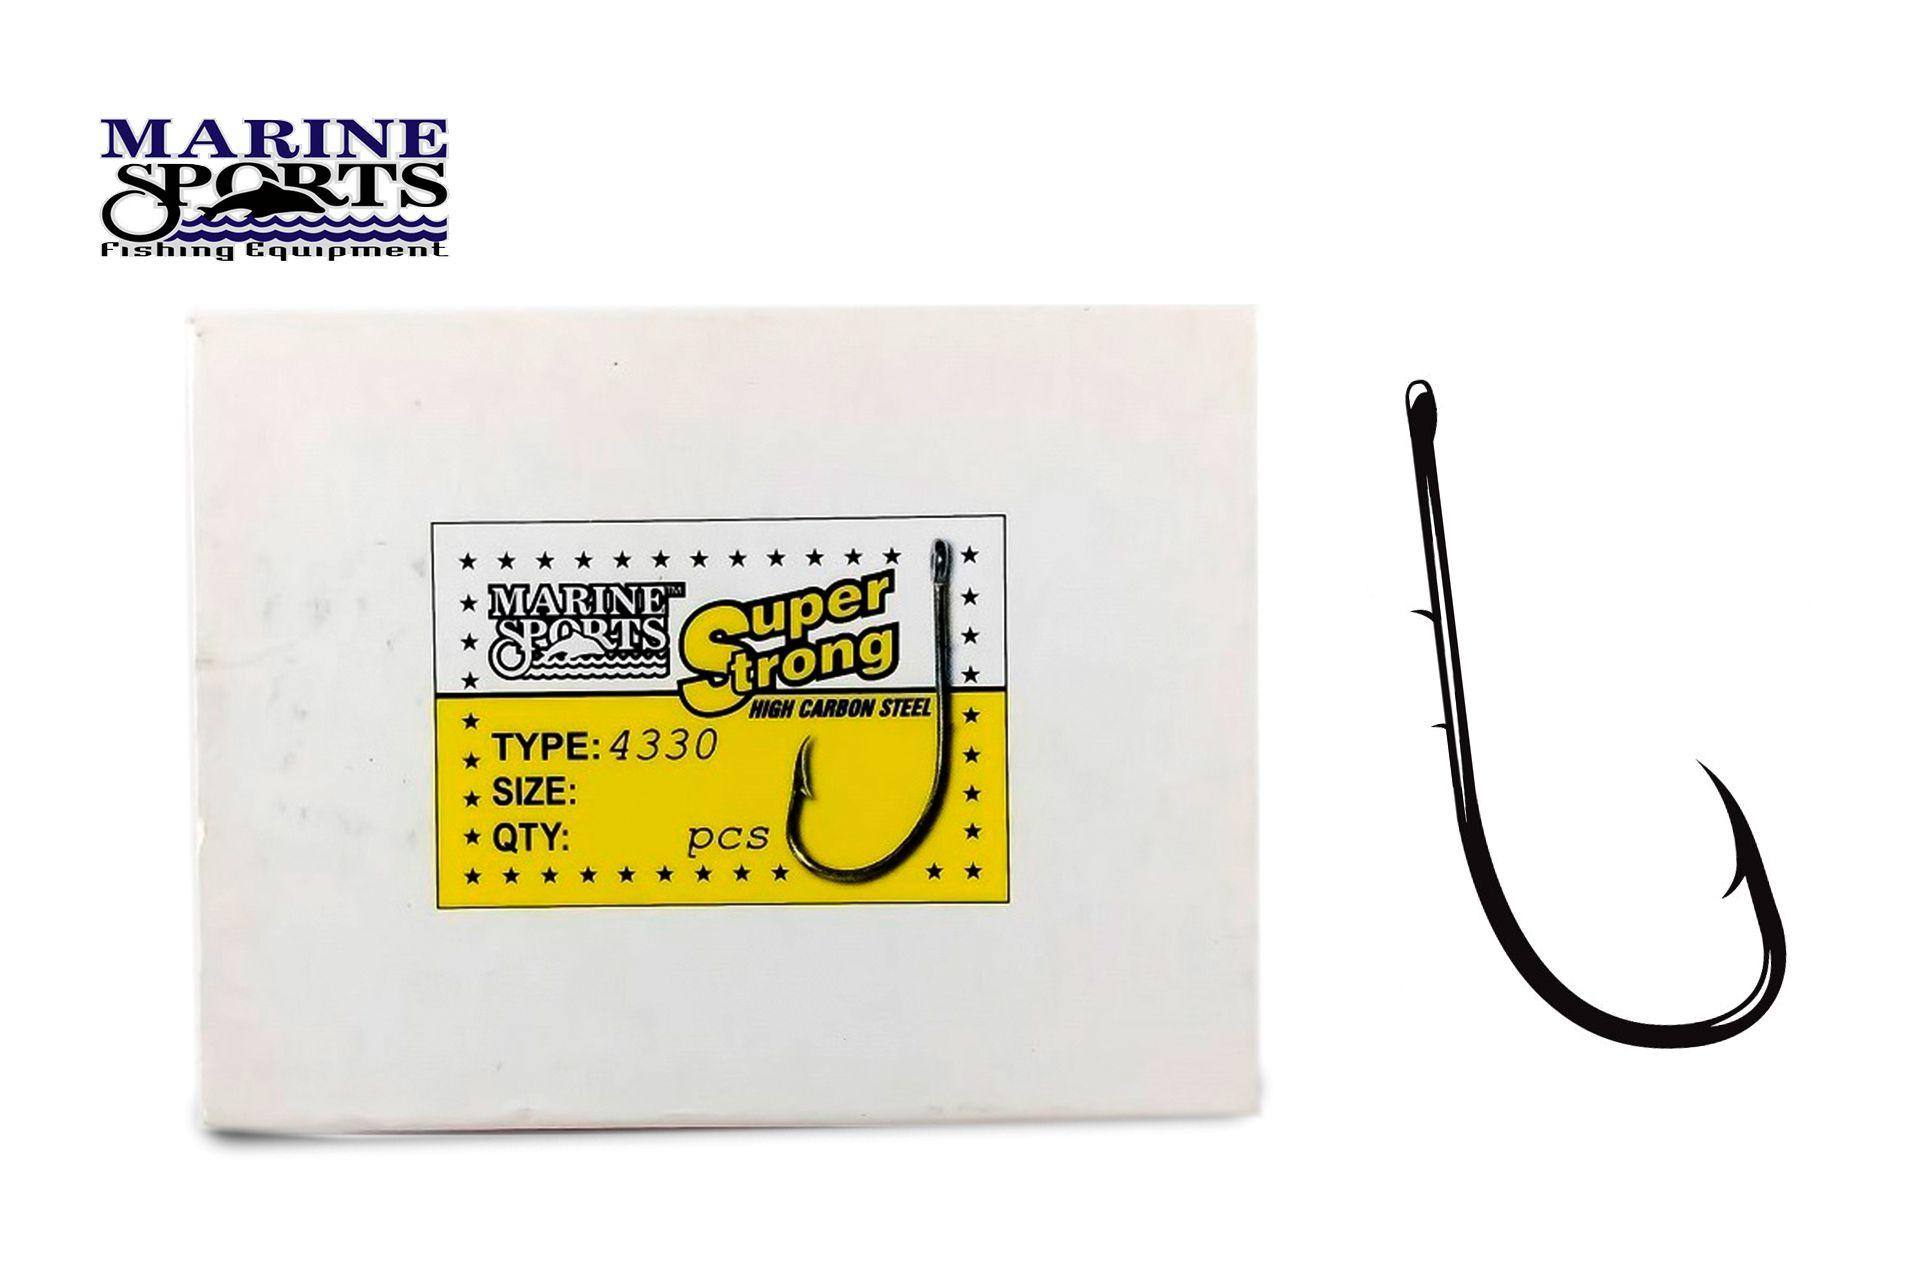 Anzol Marine Sports Super Strong 4330 N° 8 (1,8cm) C/ Farpas - 100 Peças